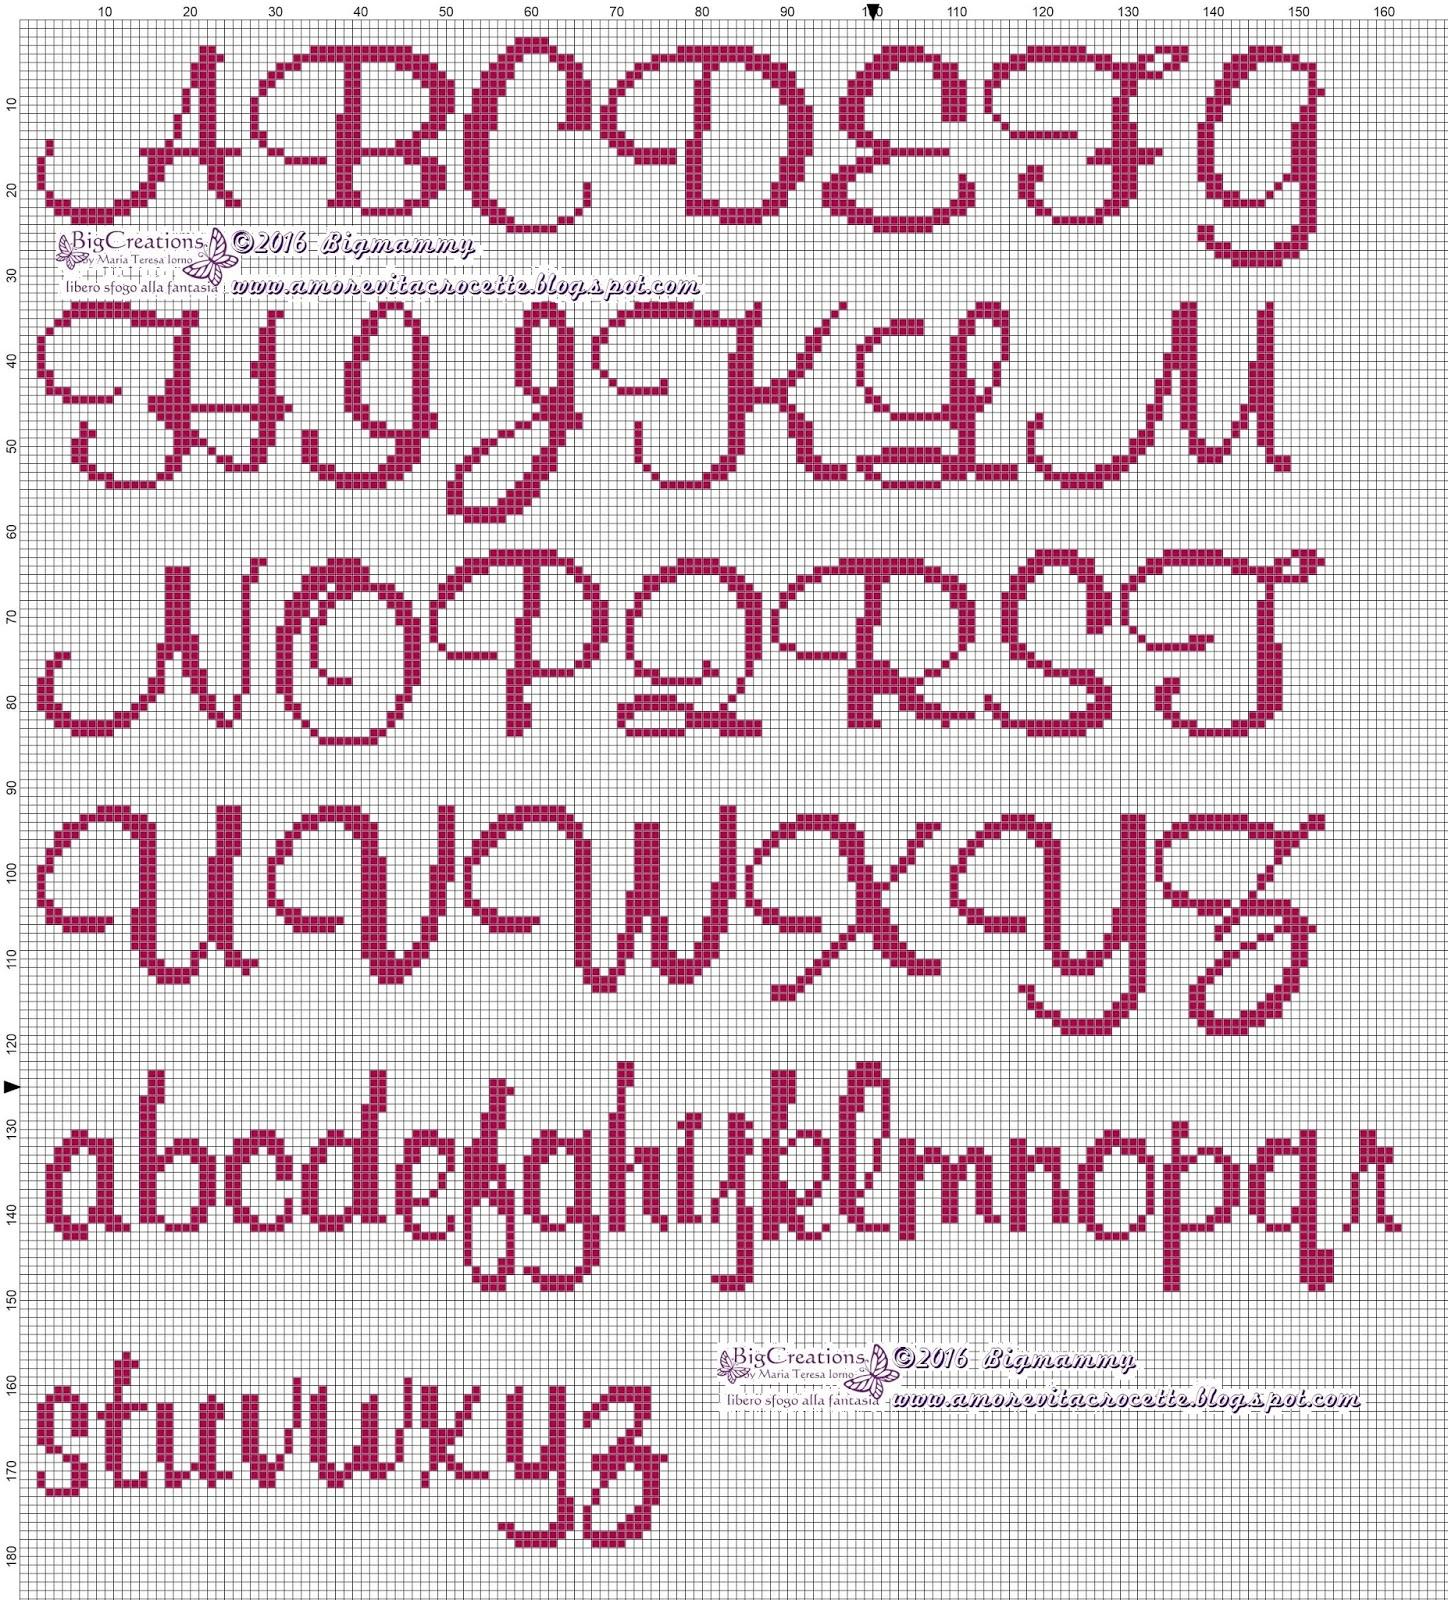 Amorevitacrocette vari alfabeti a punto croce for Alfabeti a punto croce per bambini